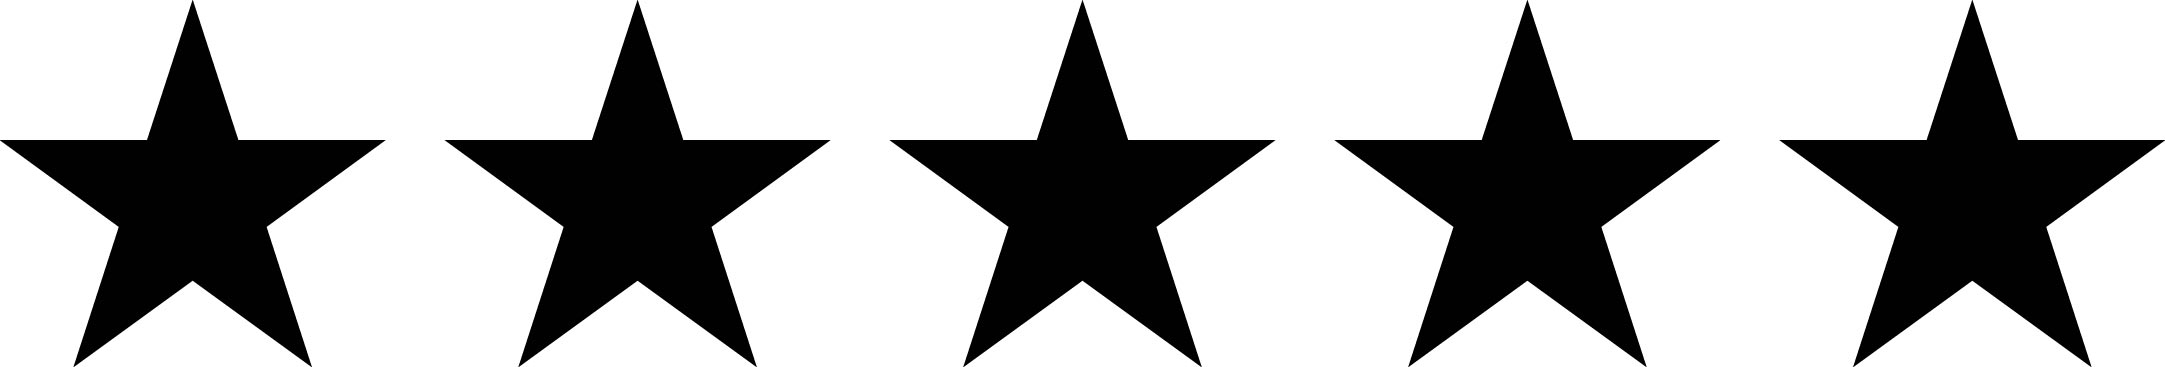 5 star image clipartsco